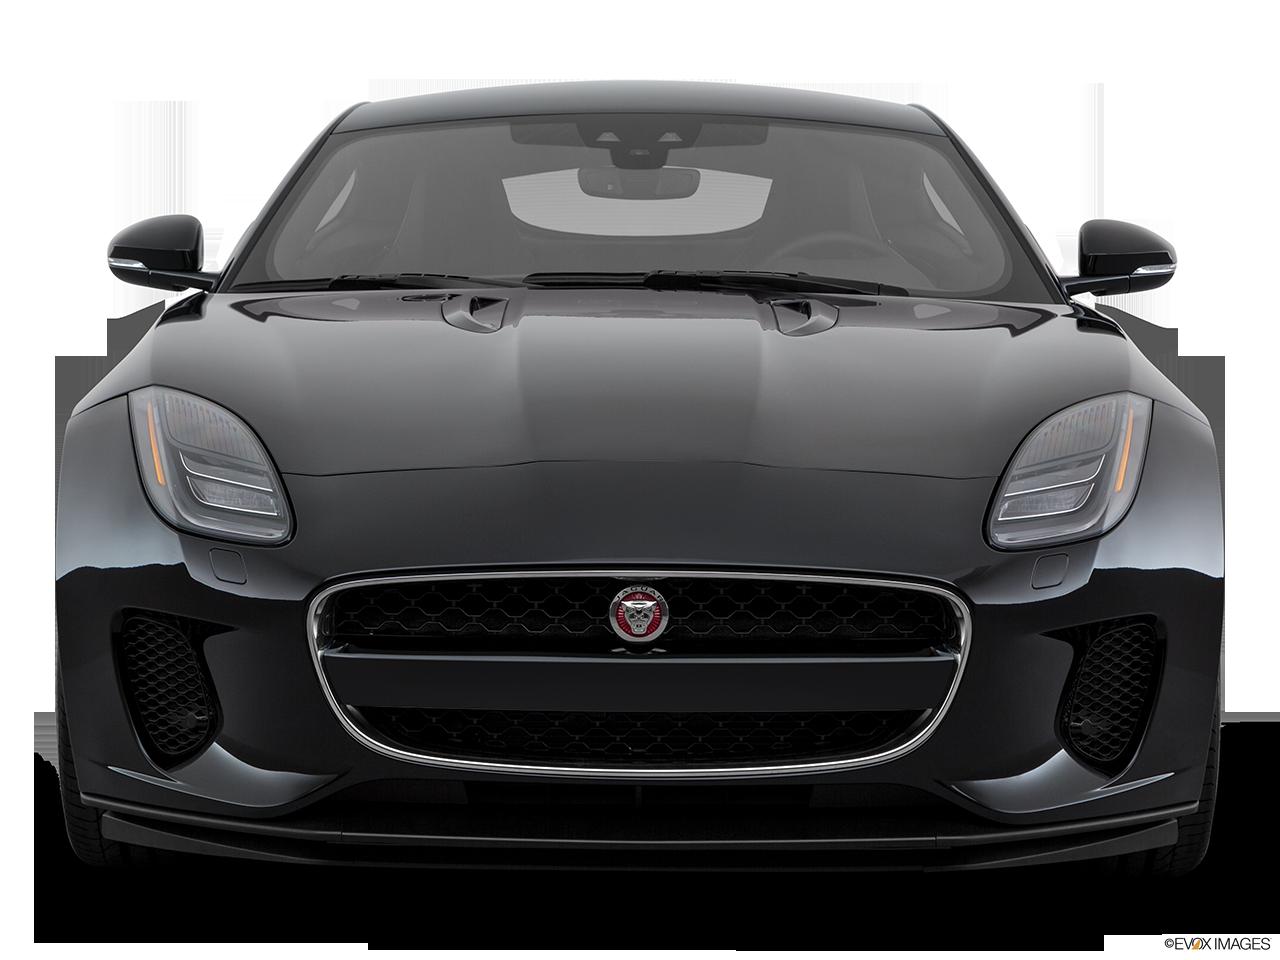 2019 Jaguar F-TYPE photo